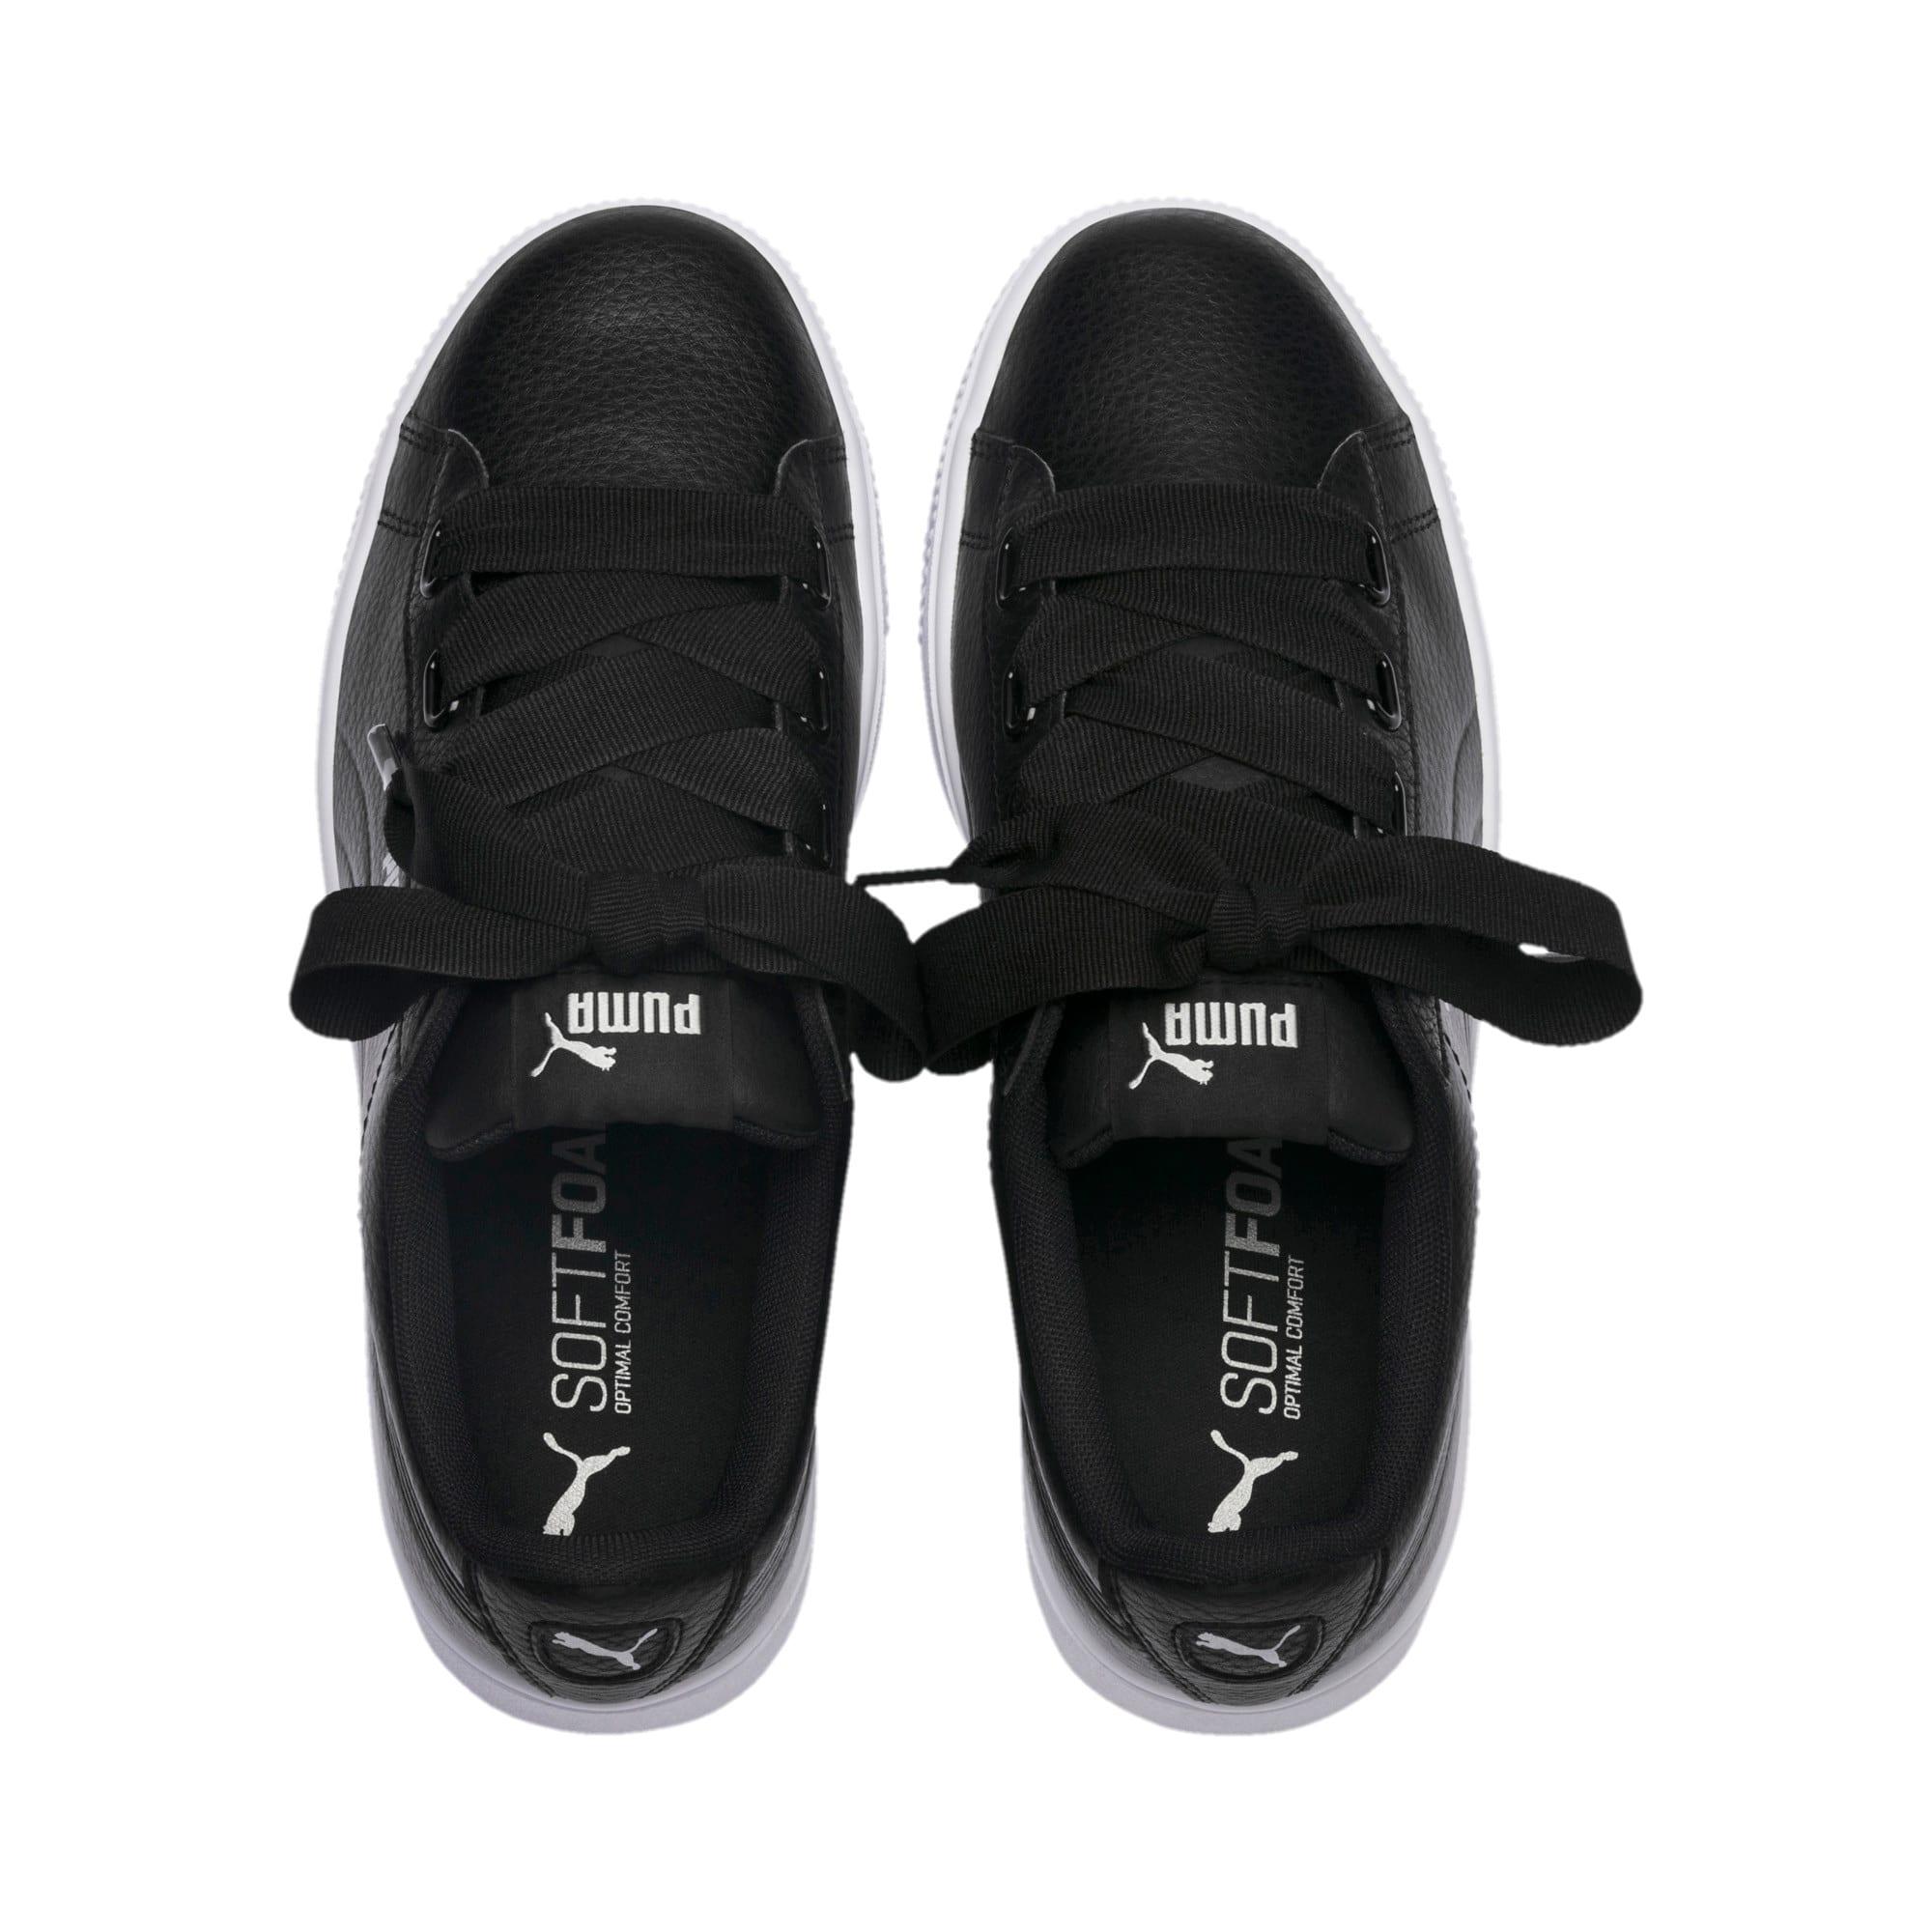 Thumbnail 6 of PUMA Vikky Stacked Ribbon Core Women's Sneakers, Puma Black-Puma Black, medium